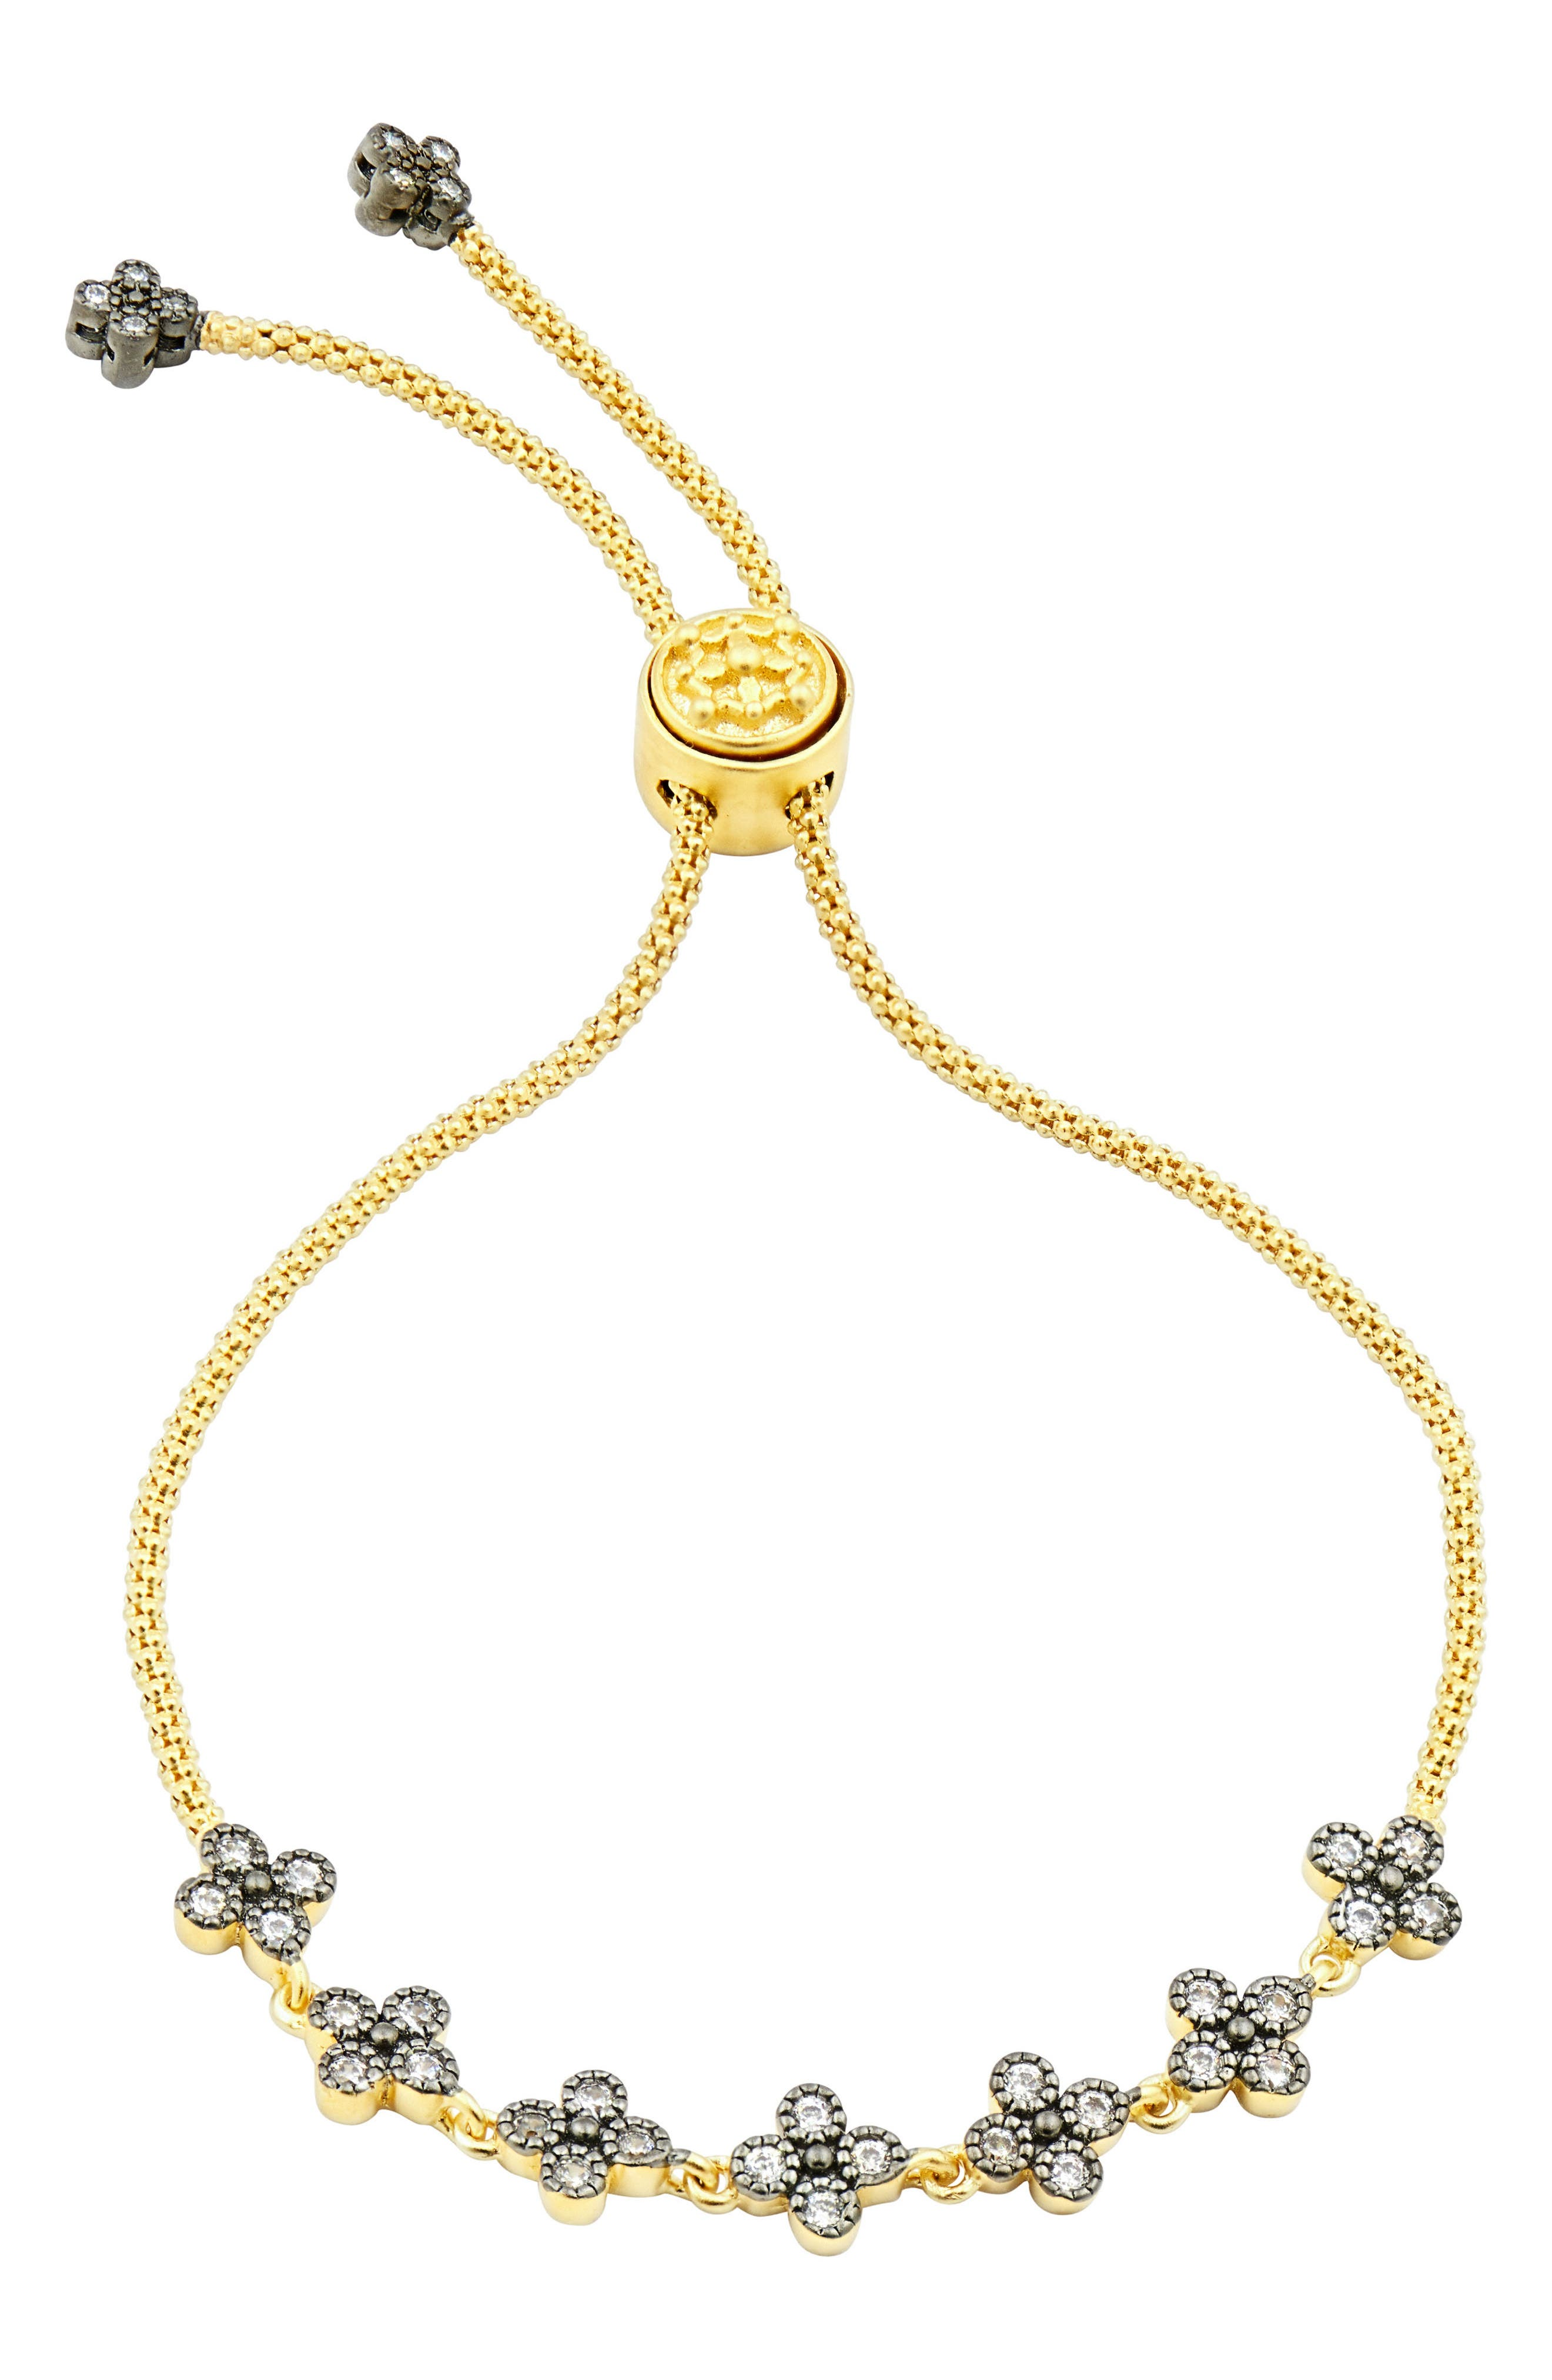 Adjustable Clover Bracelet,                             Main thumbnail 1, color,                             GOLD/ SILVER